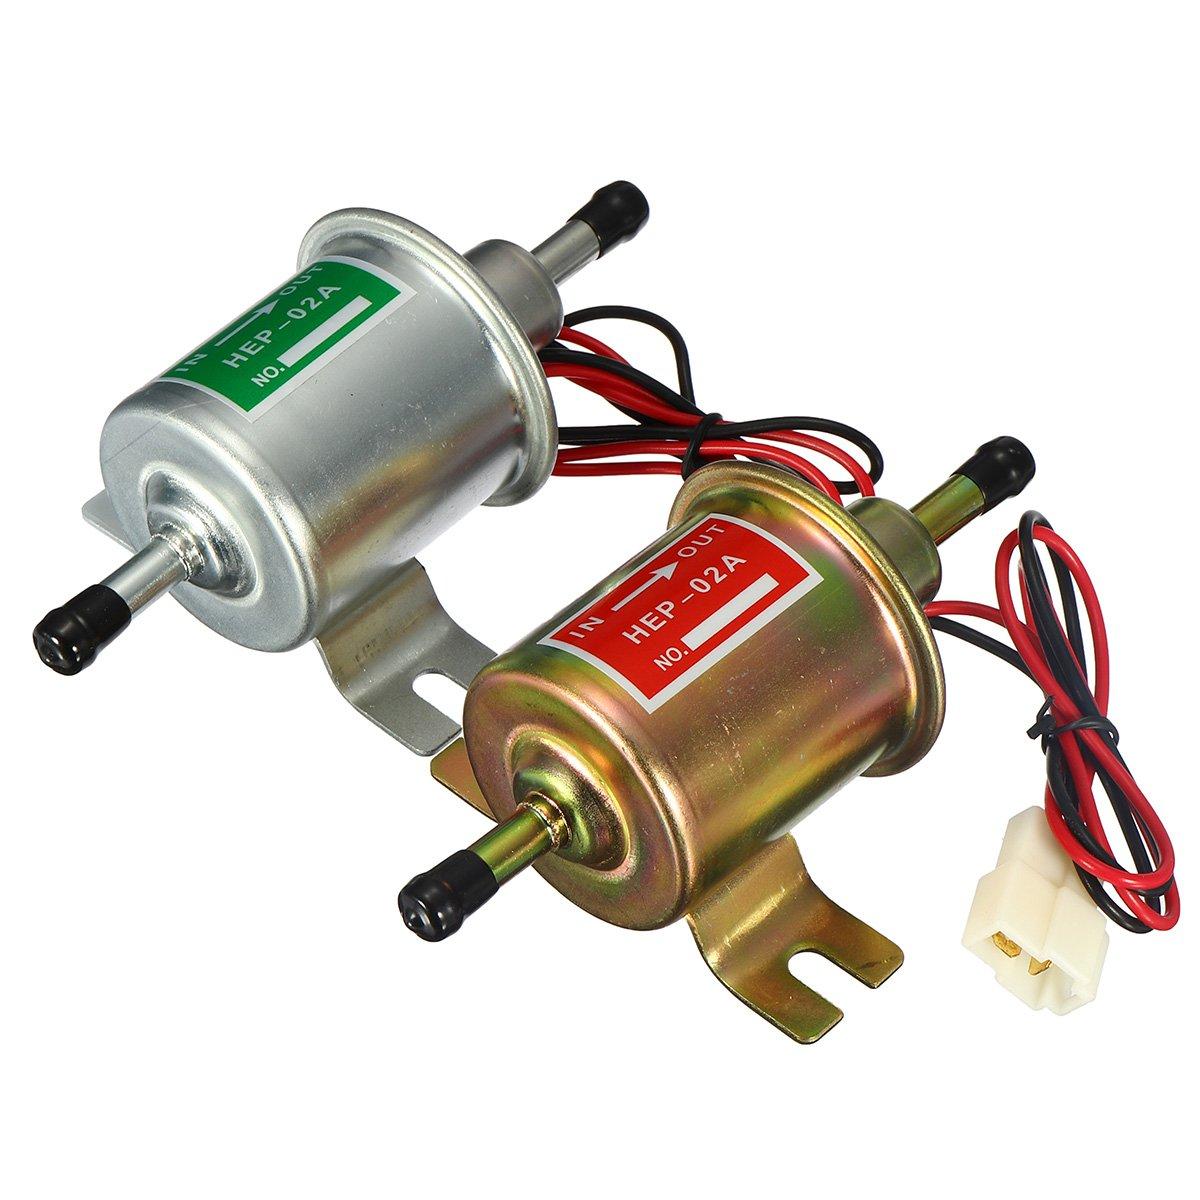 Alamor 24V Universal Diesel Essence Pompe /À Carburant /Électrique Hep-02A Basse Pression